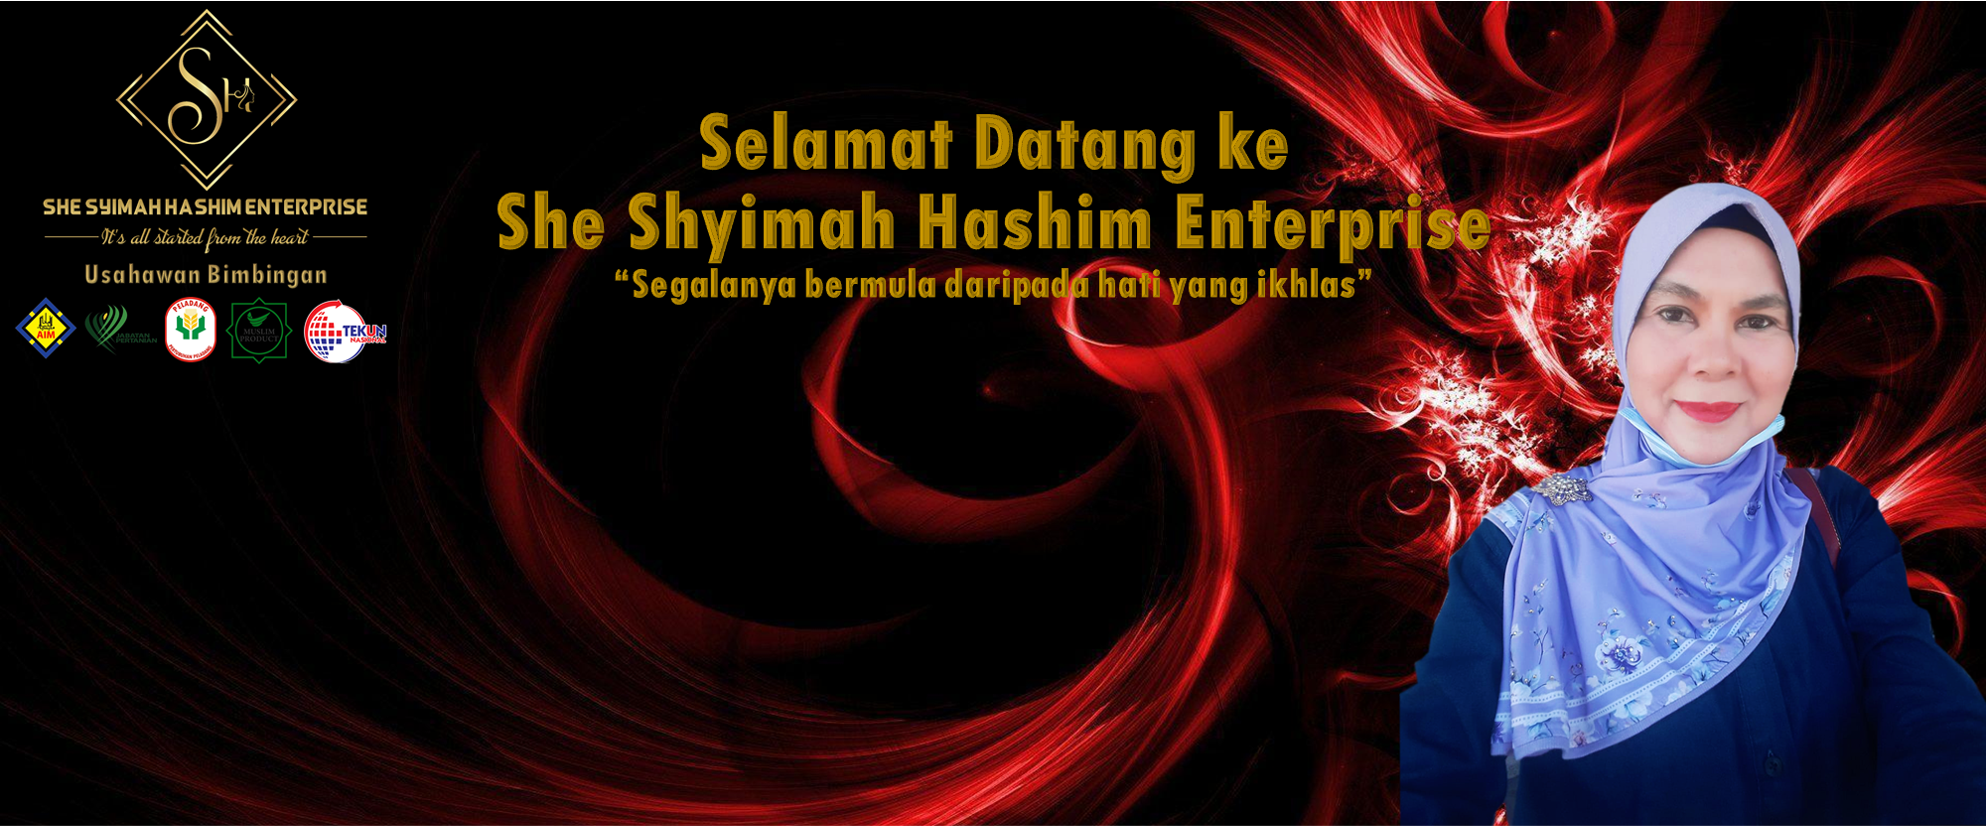 She Syimah Hashim Enterprise |